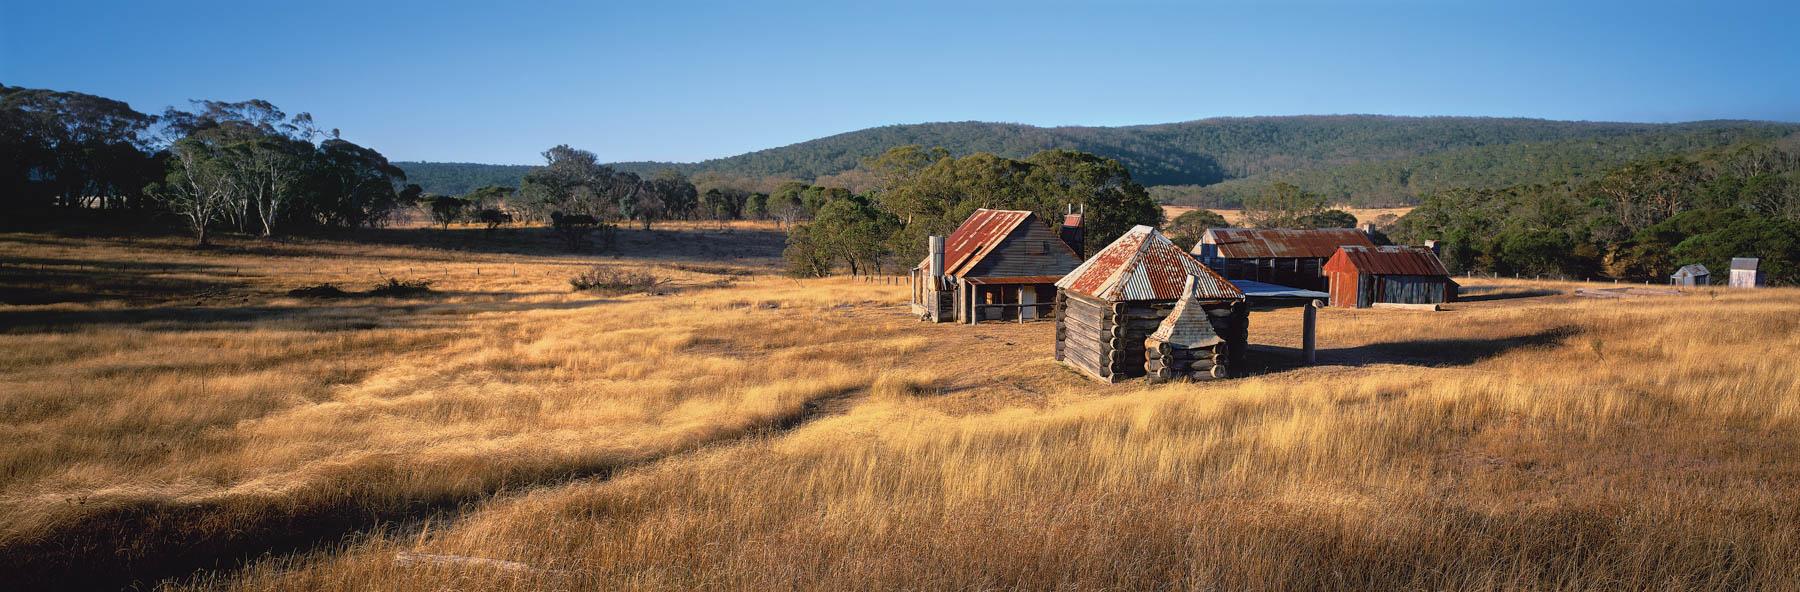 Coolamine Homestead, NSW, Australia.